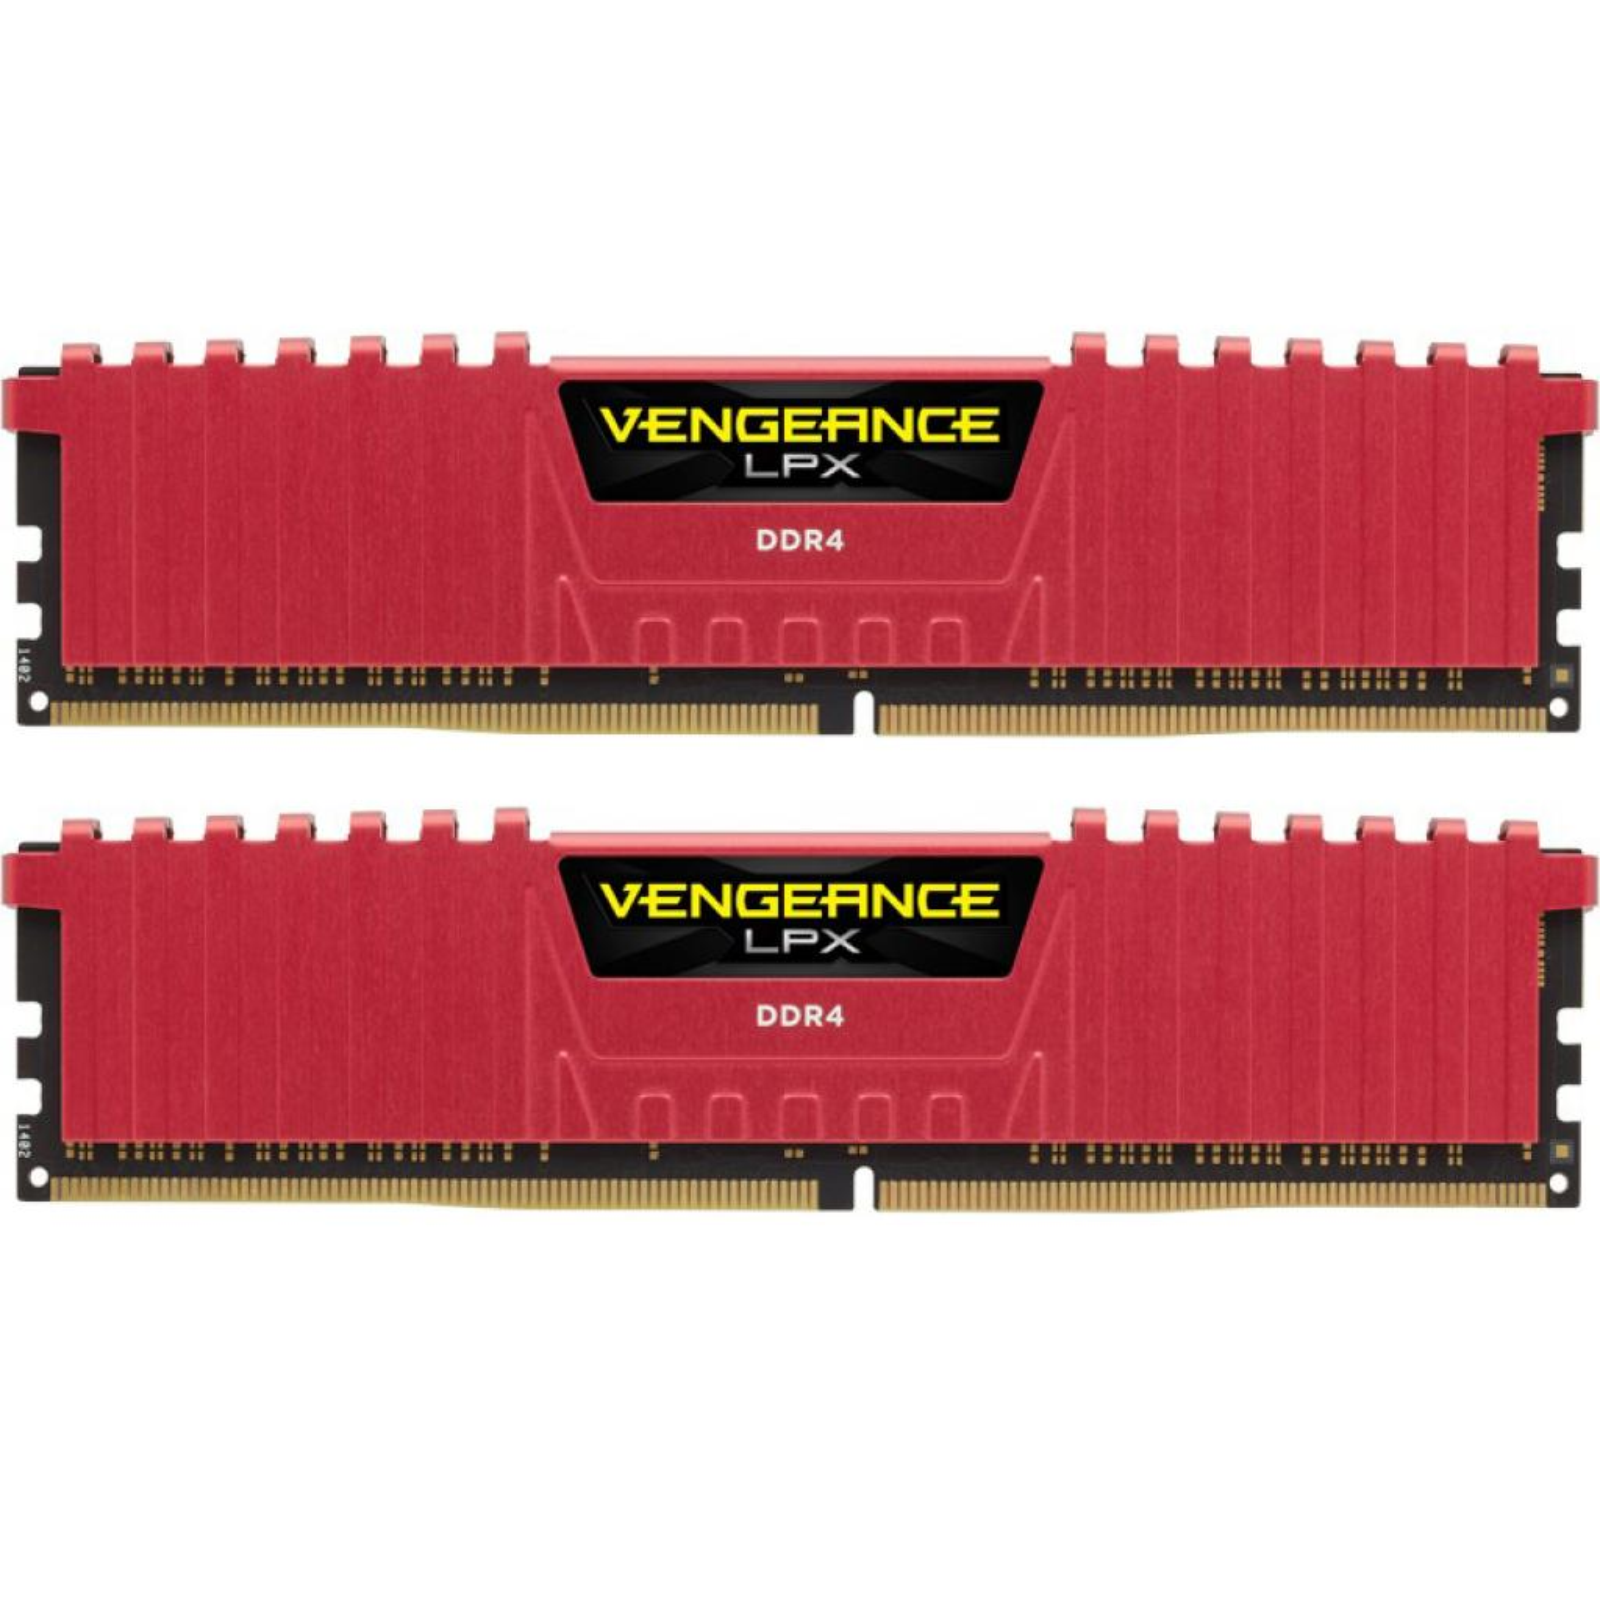 Модуль памяти для компьютера DDR4 16GB (2x8GB) 2666 MHz Vengeance LPX Red CORSAIR (CMK16GX4M2A2666C16R)